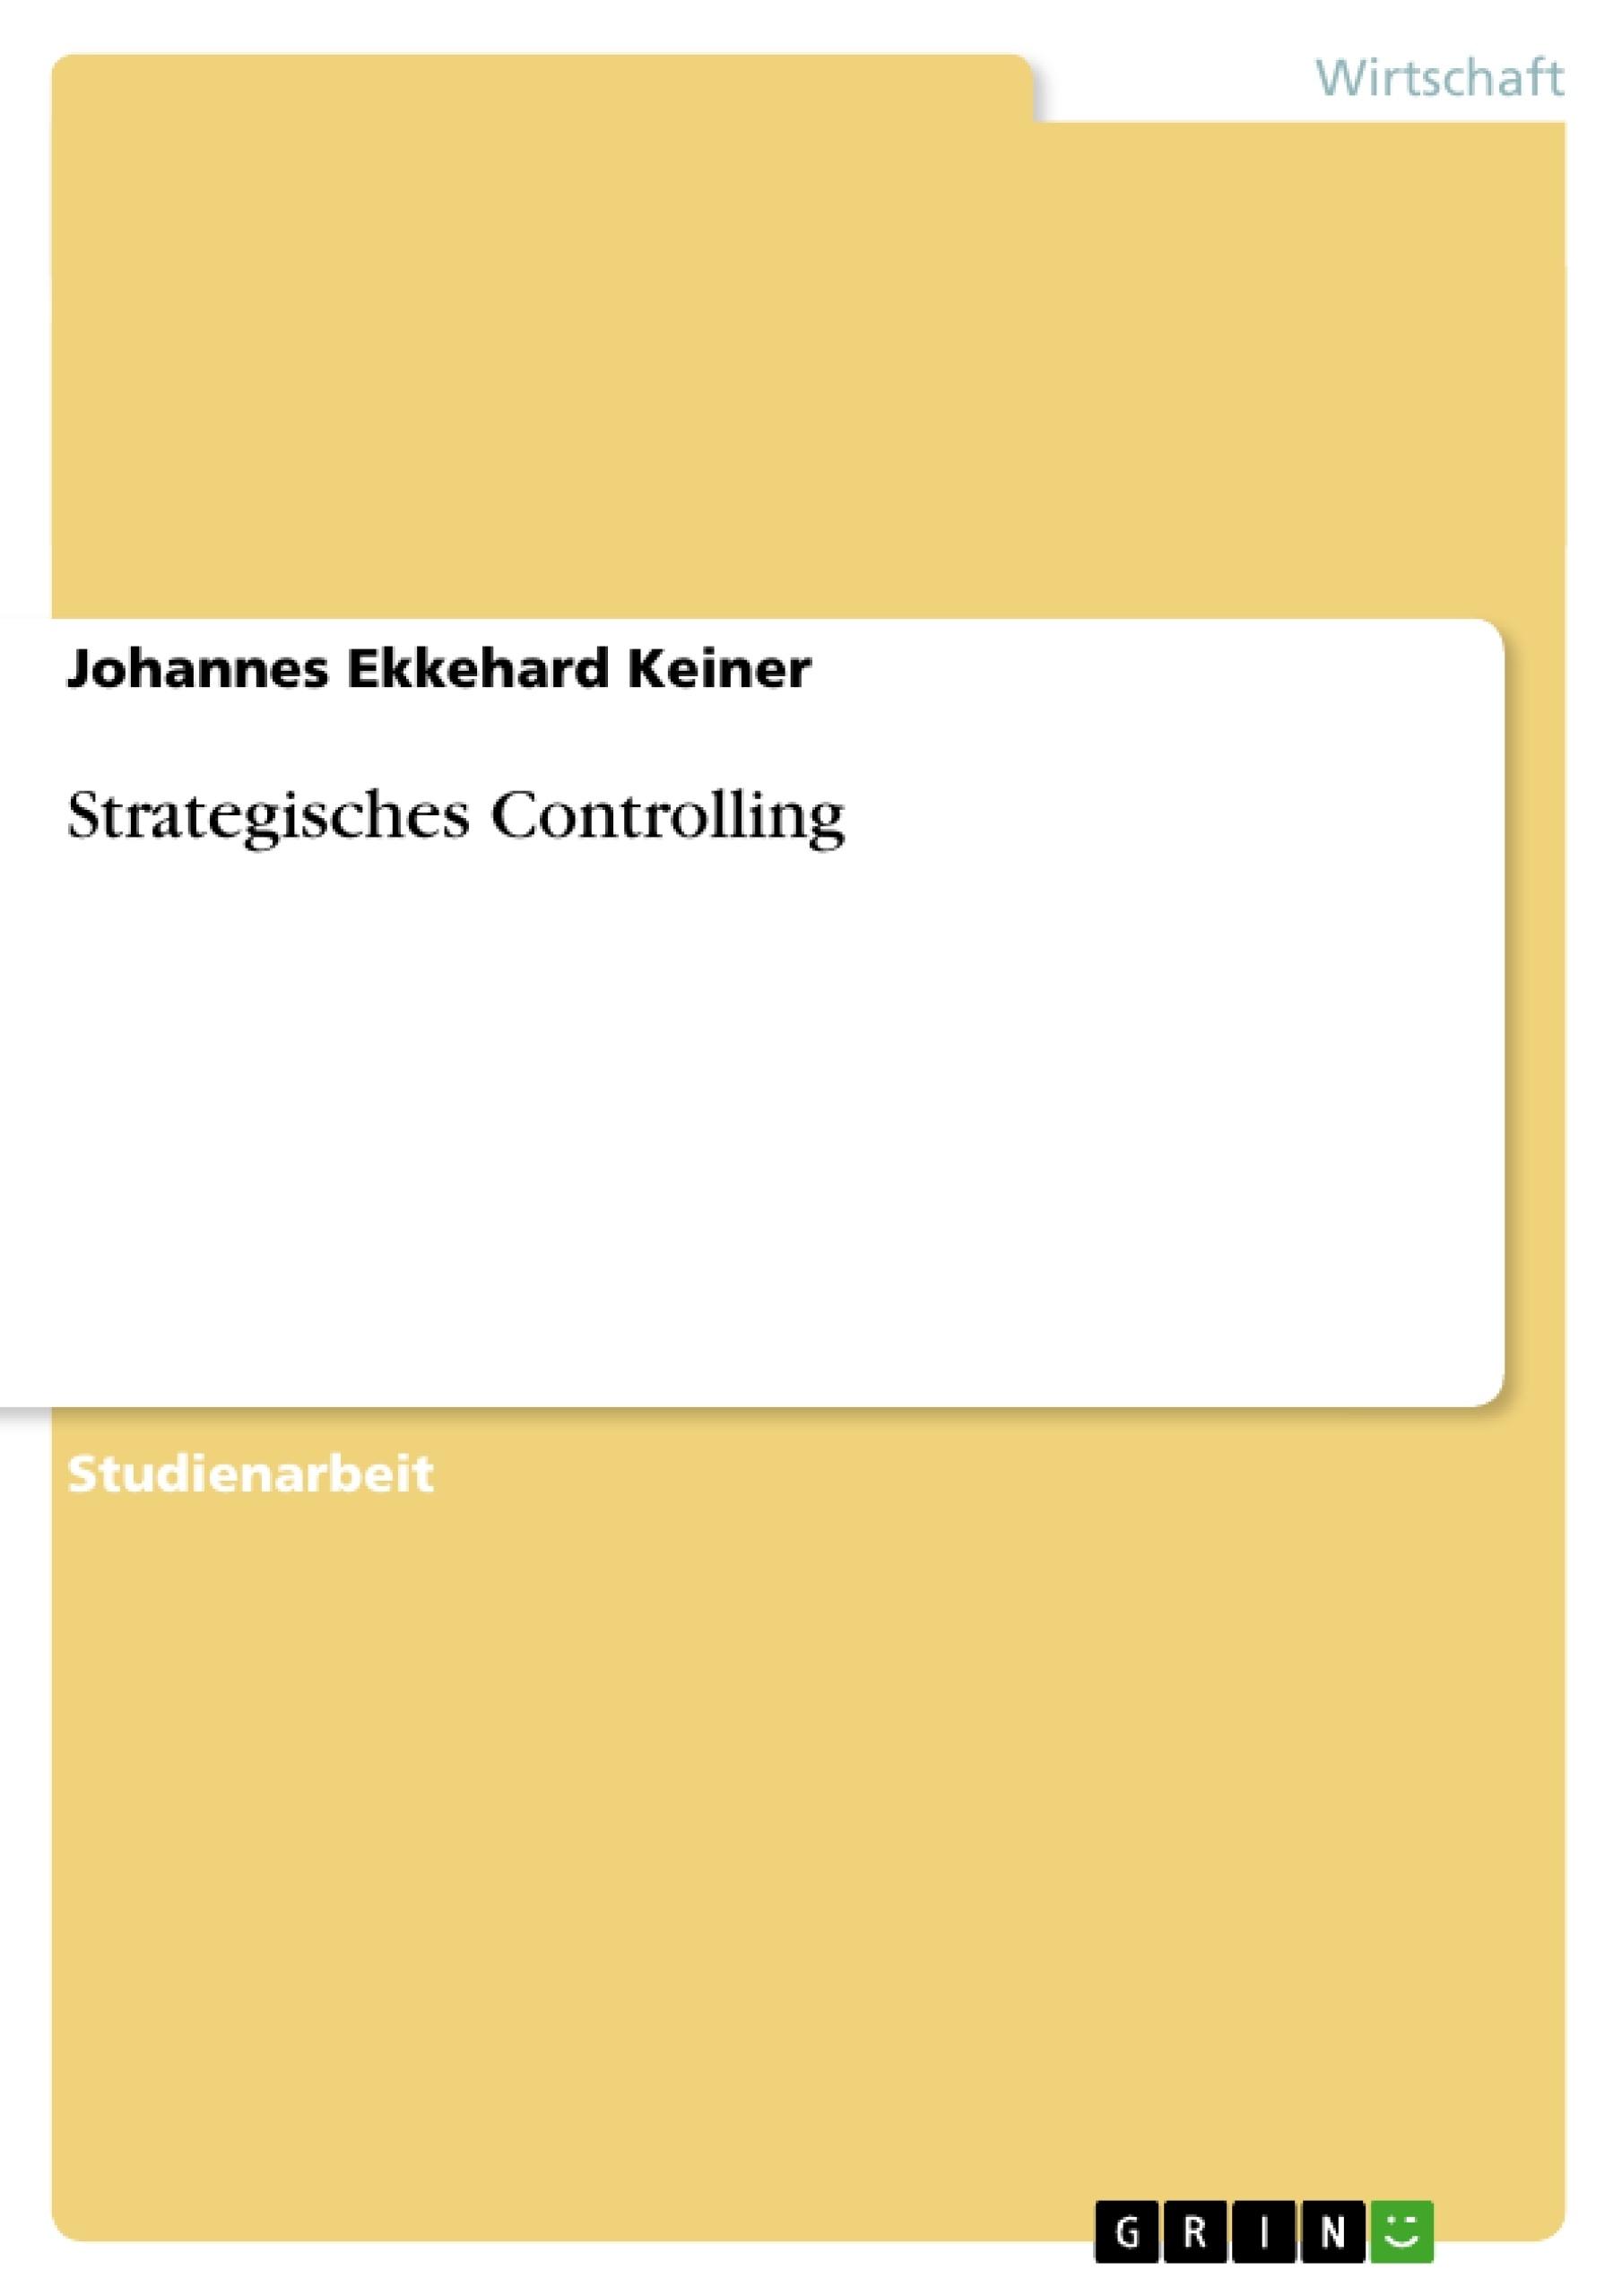 Titel: Strategisches Controlling